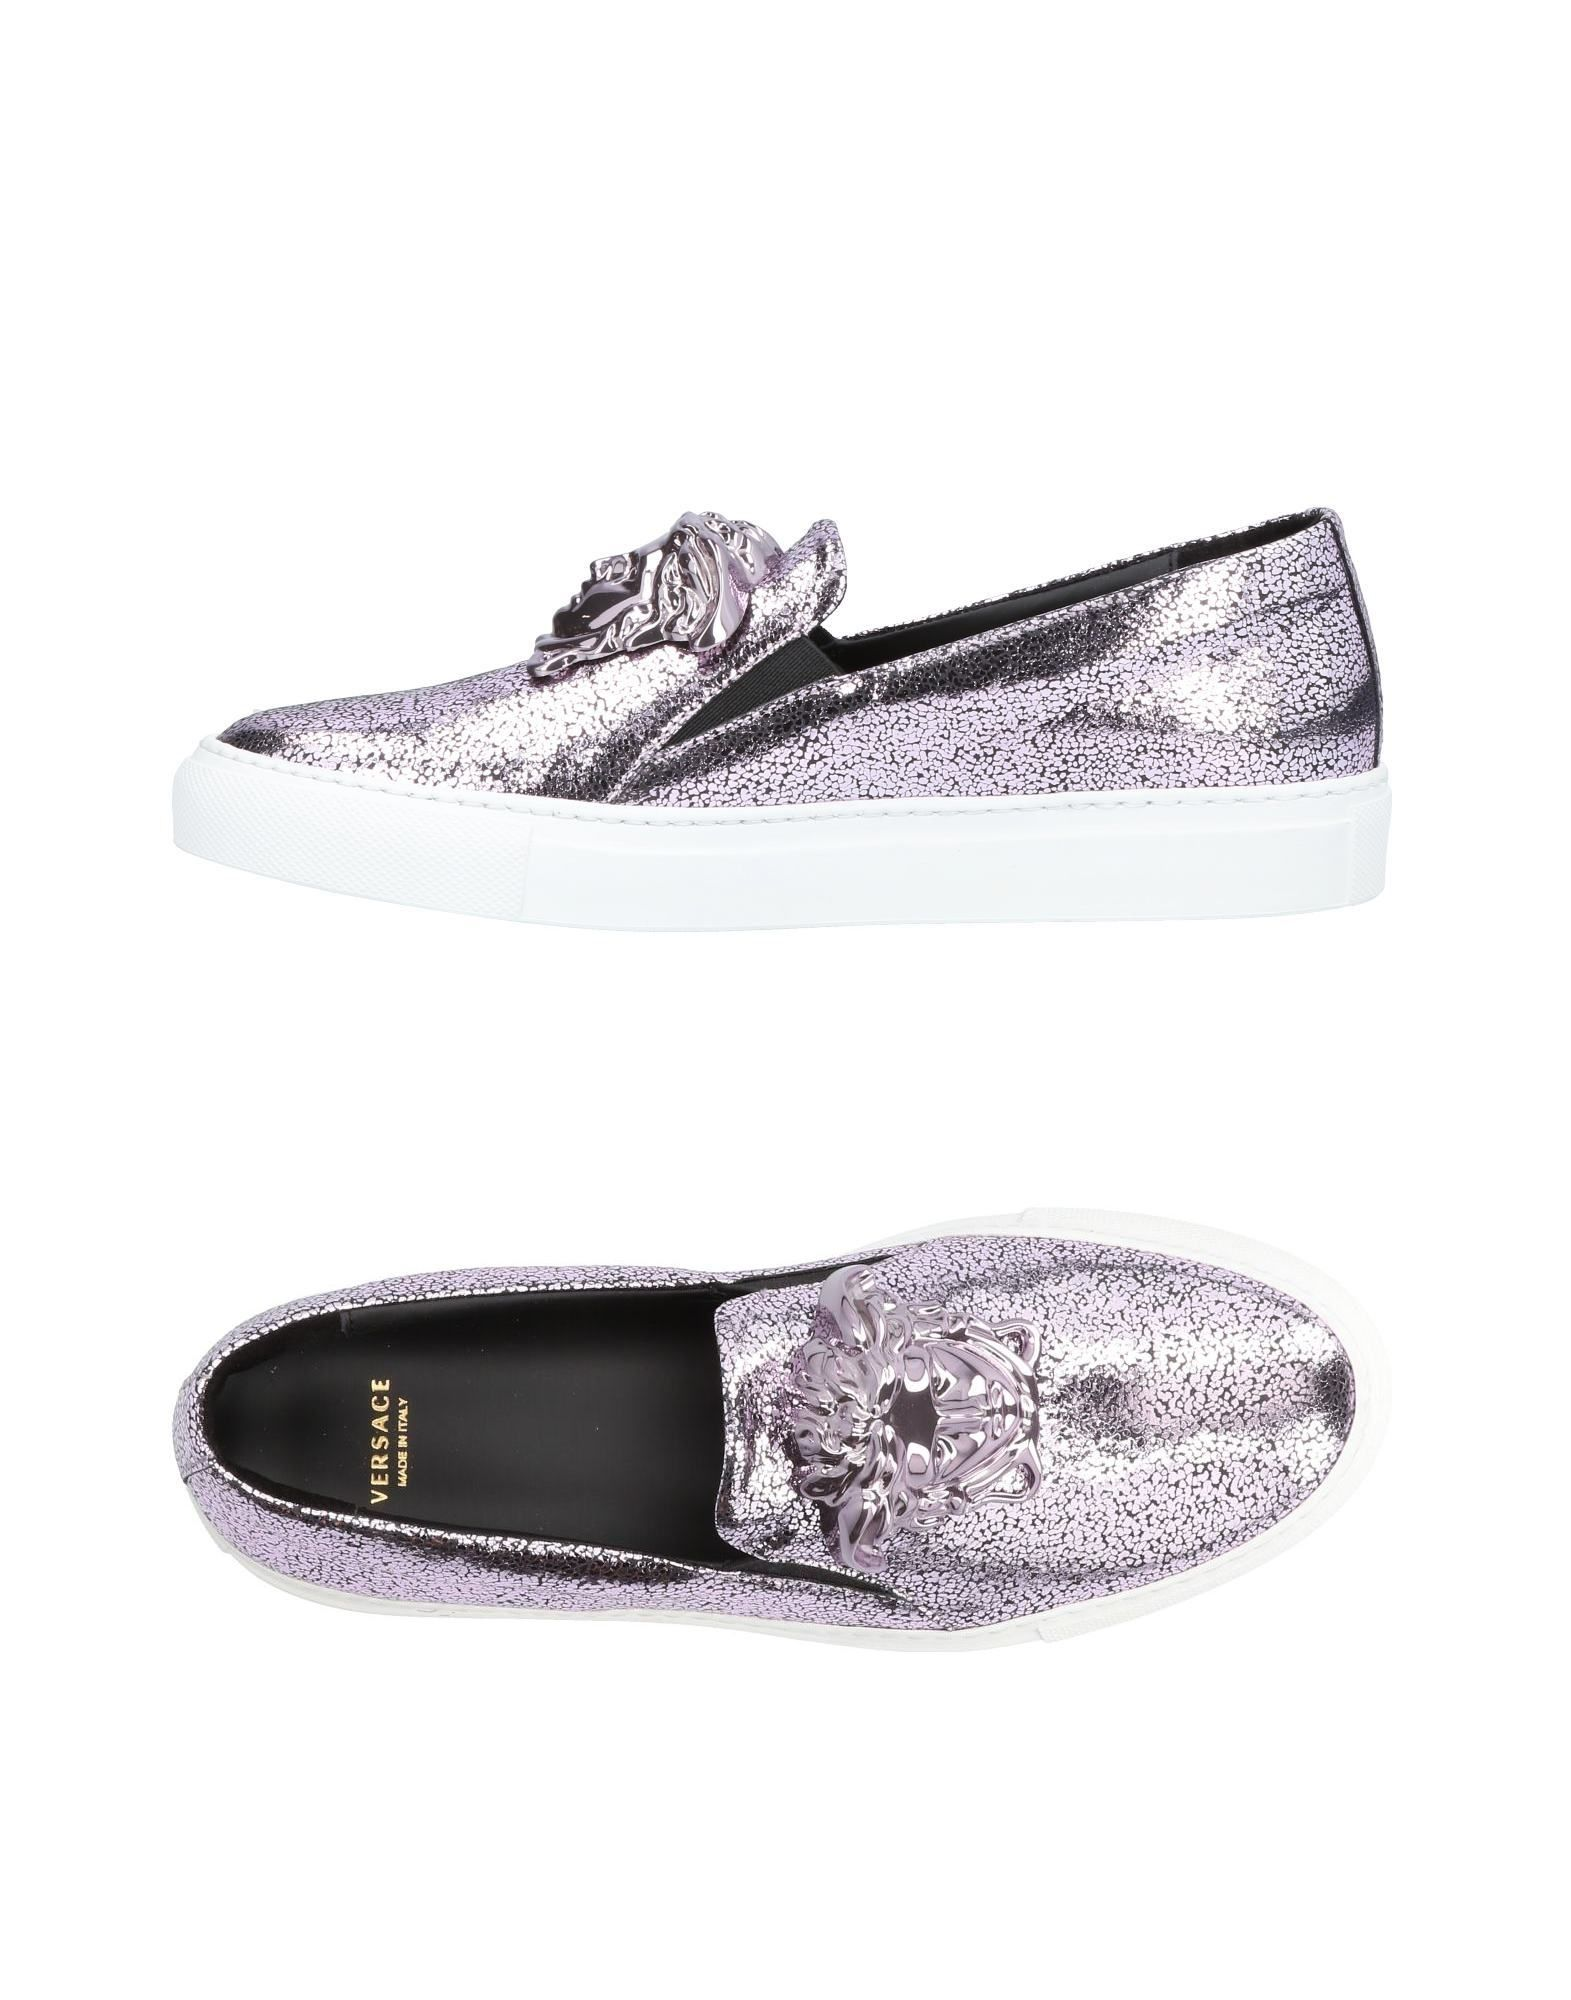 Versace Sneakers Damen gut  11433276XHGünstige gut Damen aussehende Schuhe b3c6c0